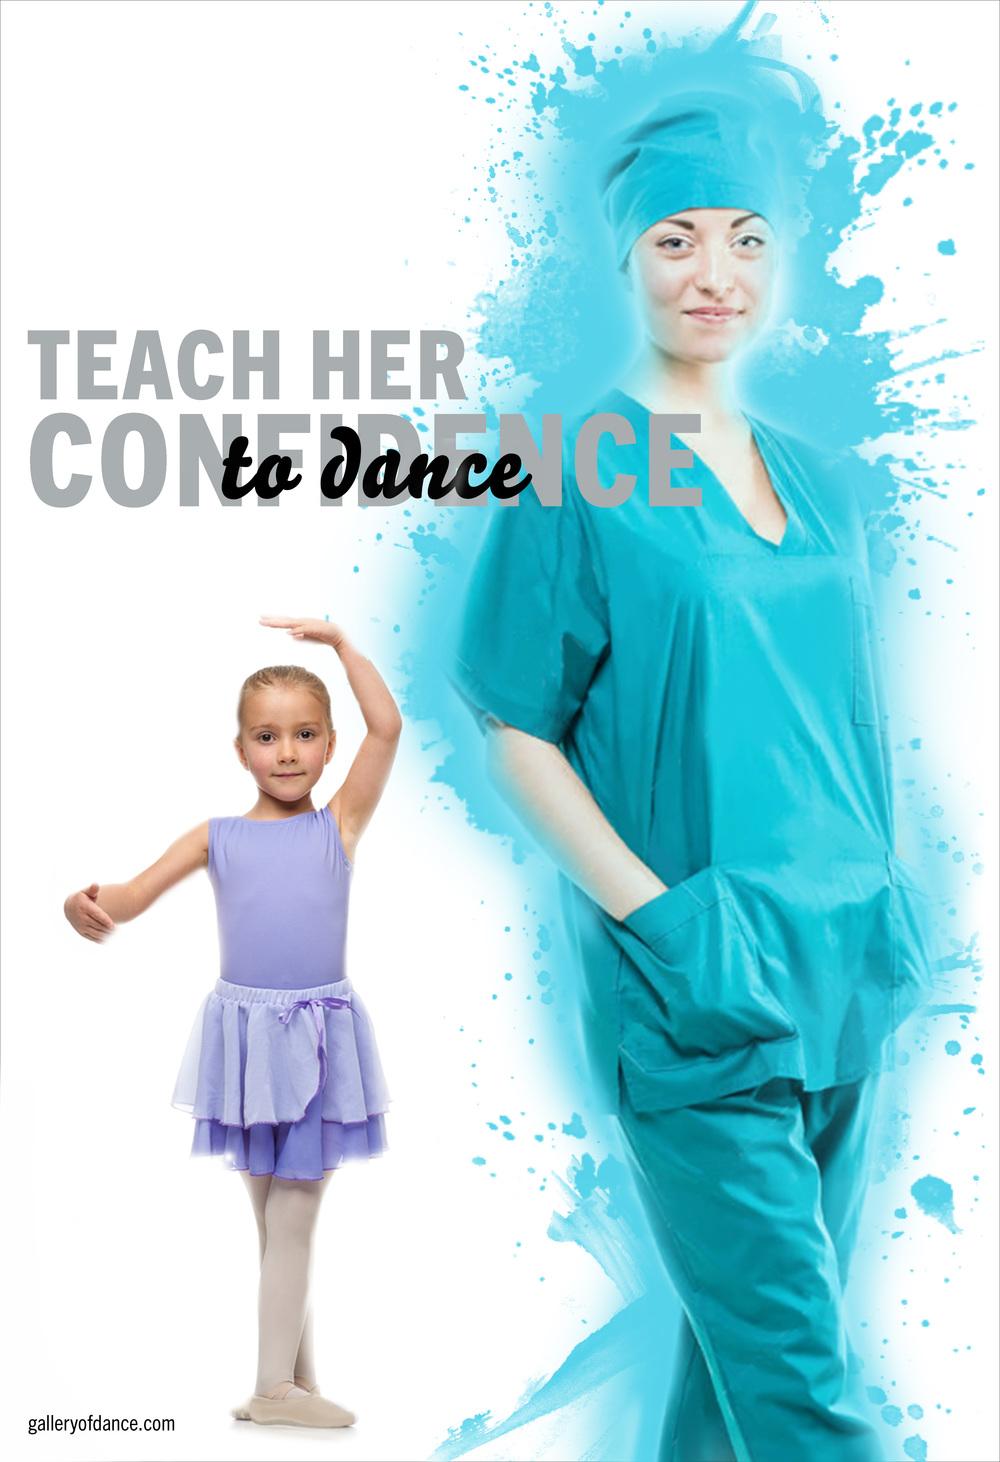 teachherconfidence1.jpg